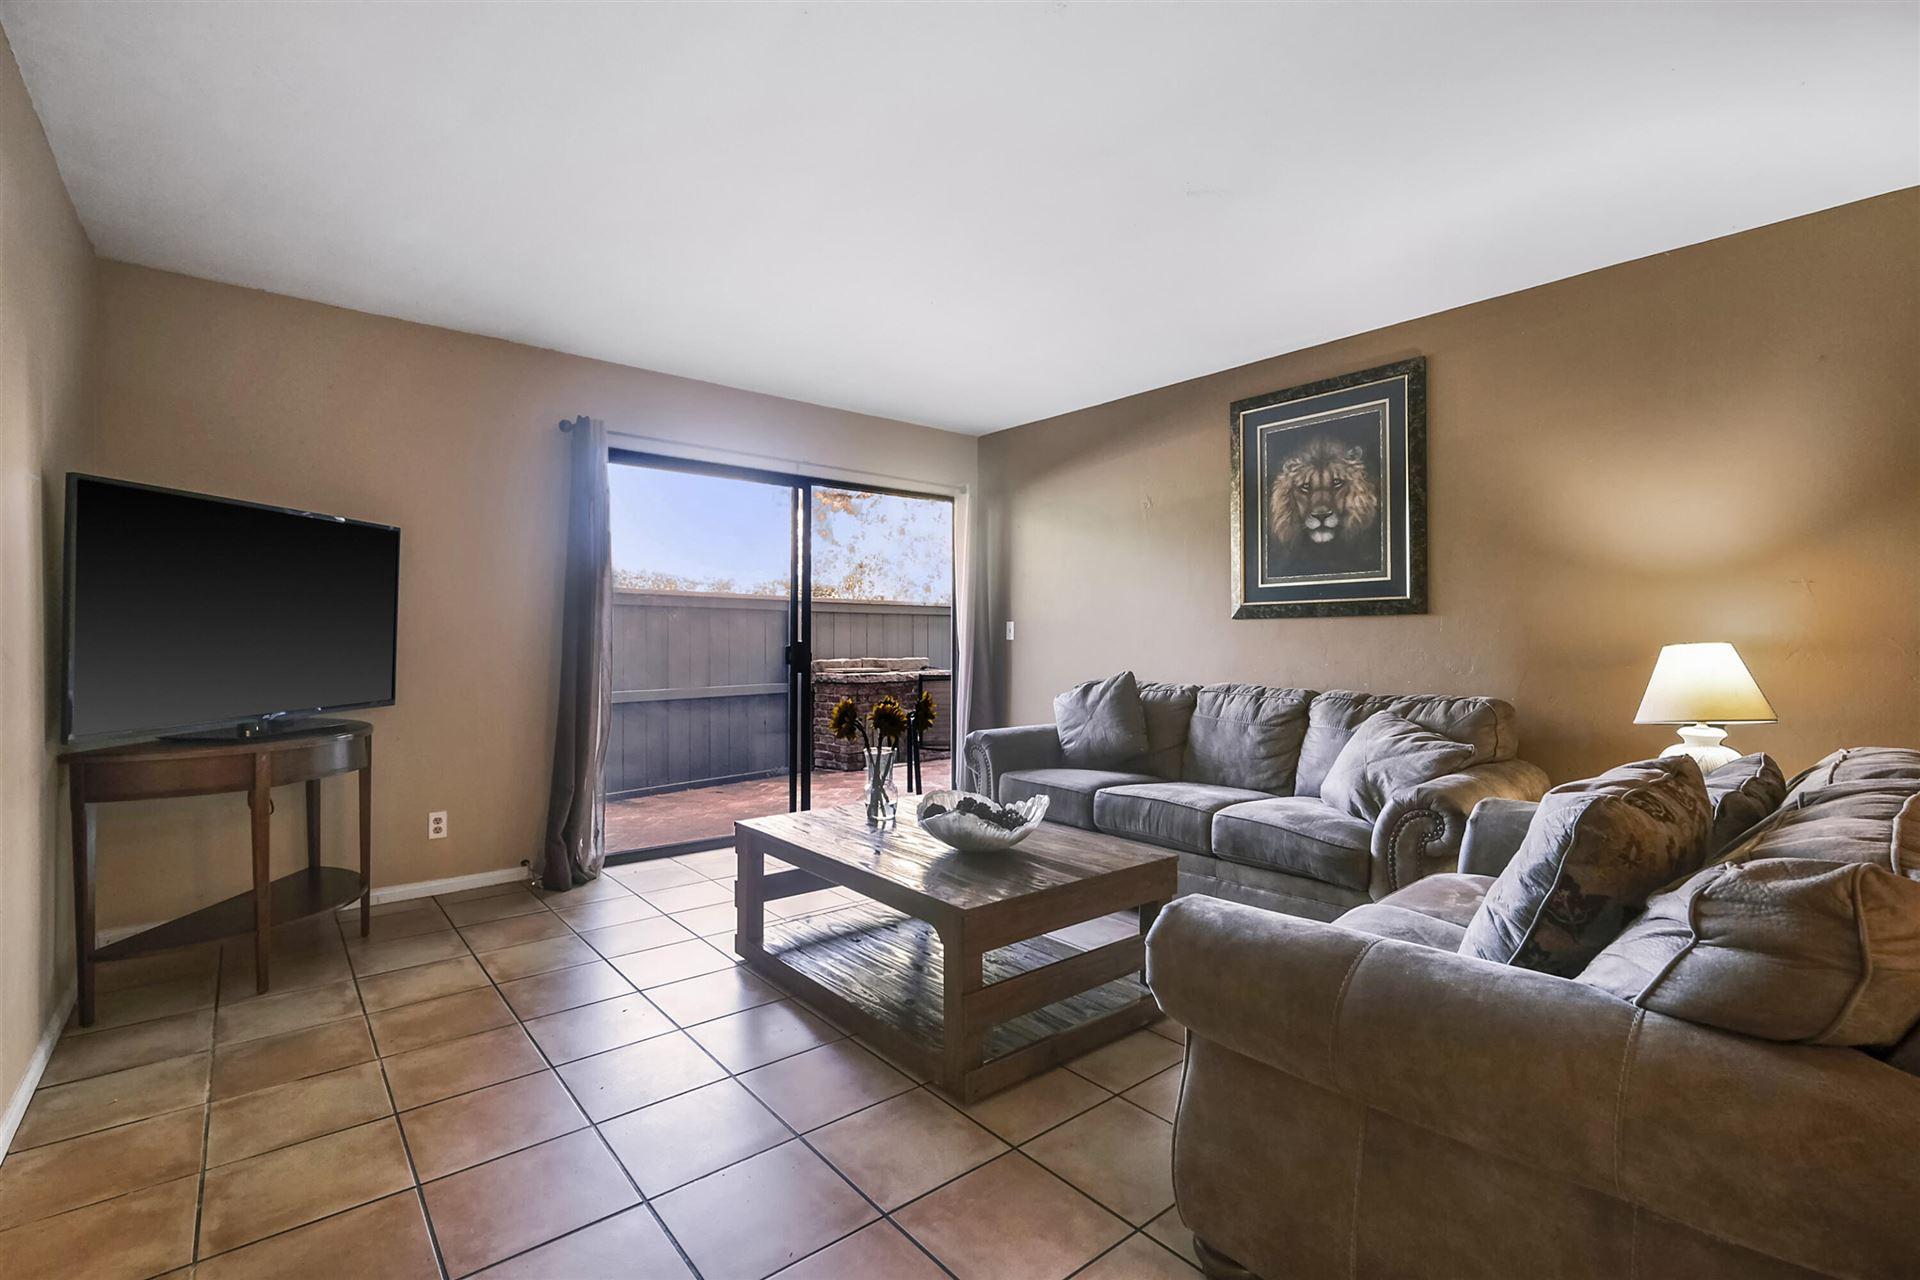 31 Dearborn Pl Apt 27, Goleta, CA 93117 - MLS#: 21-3845